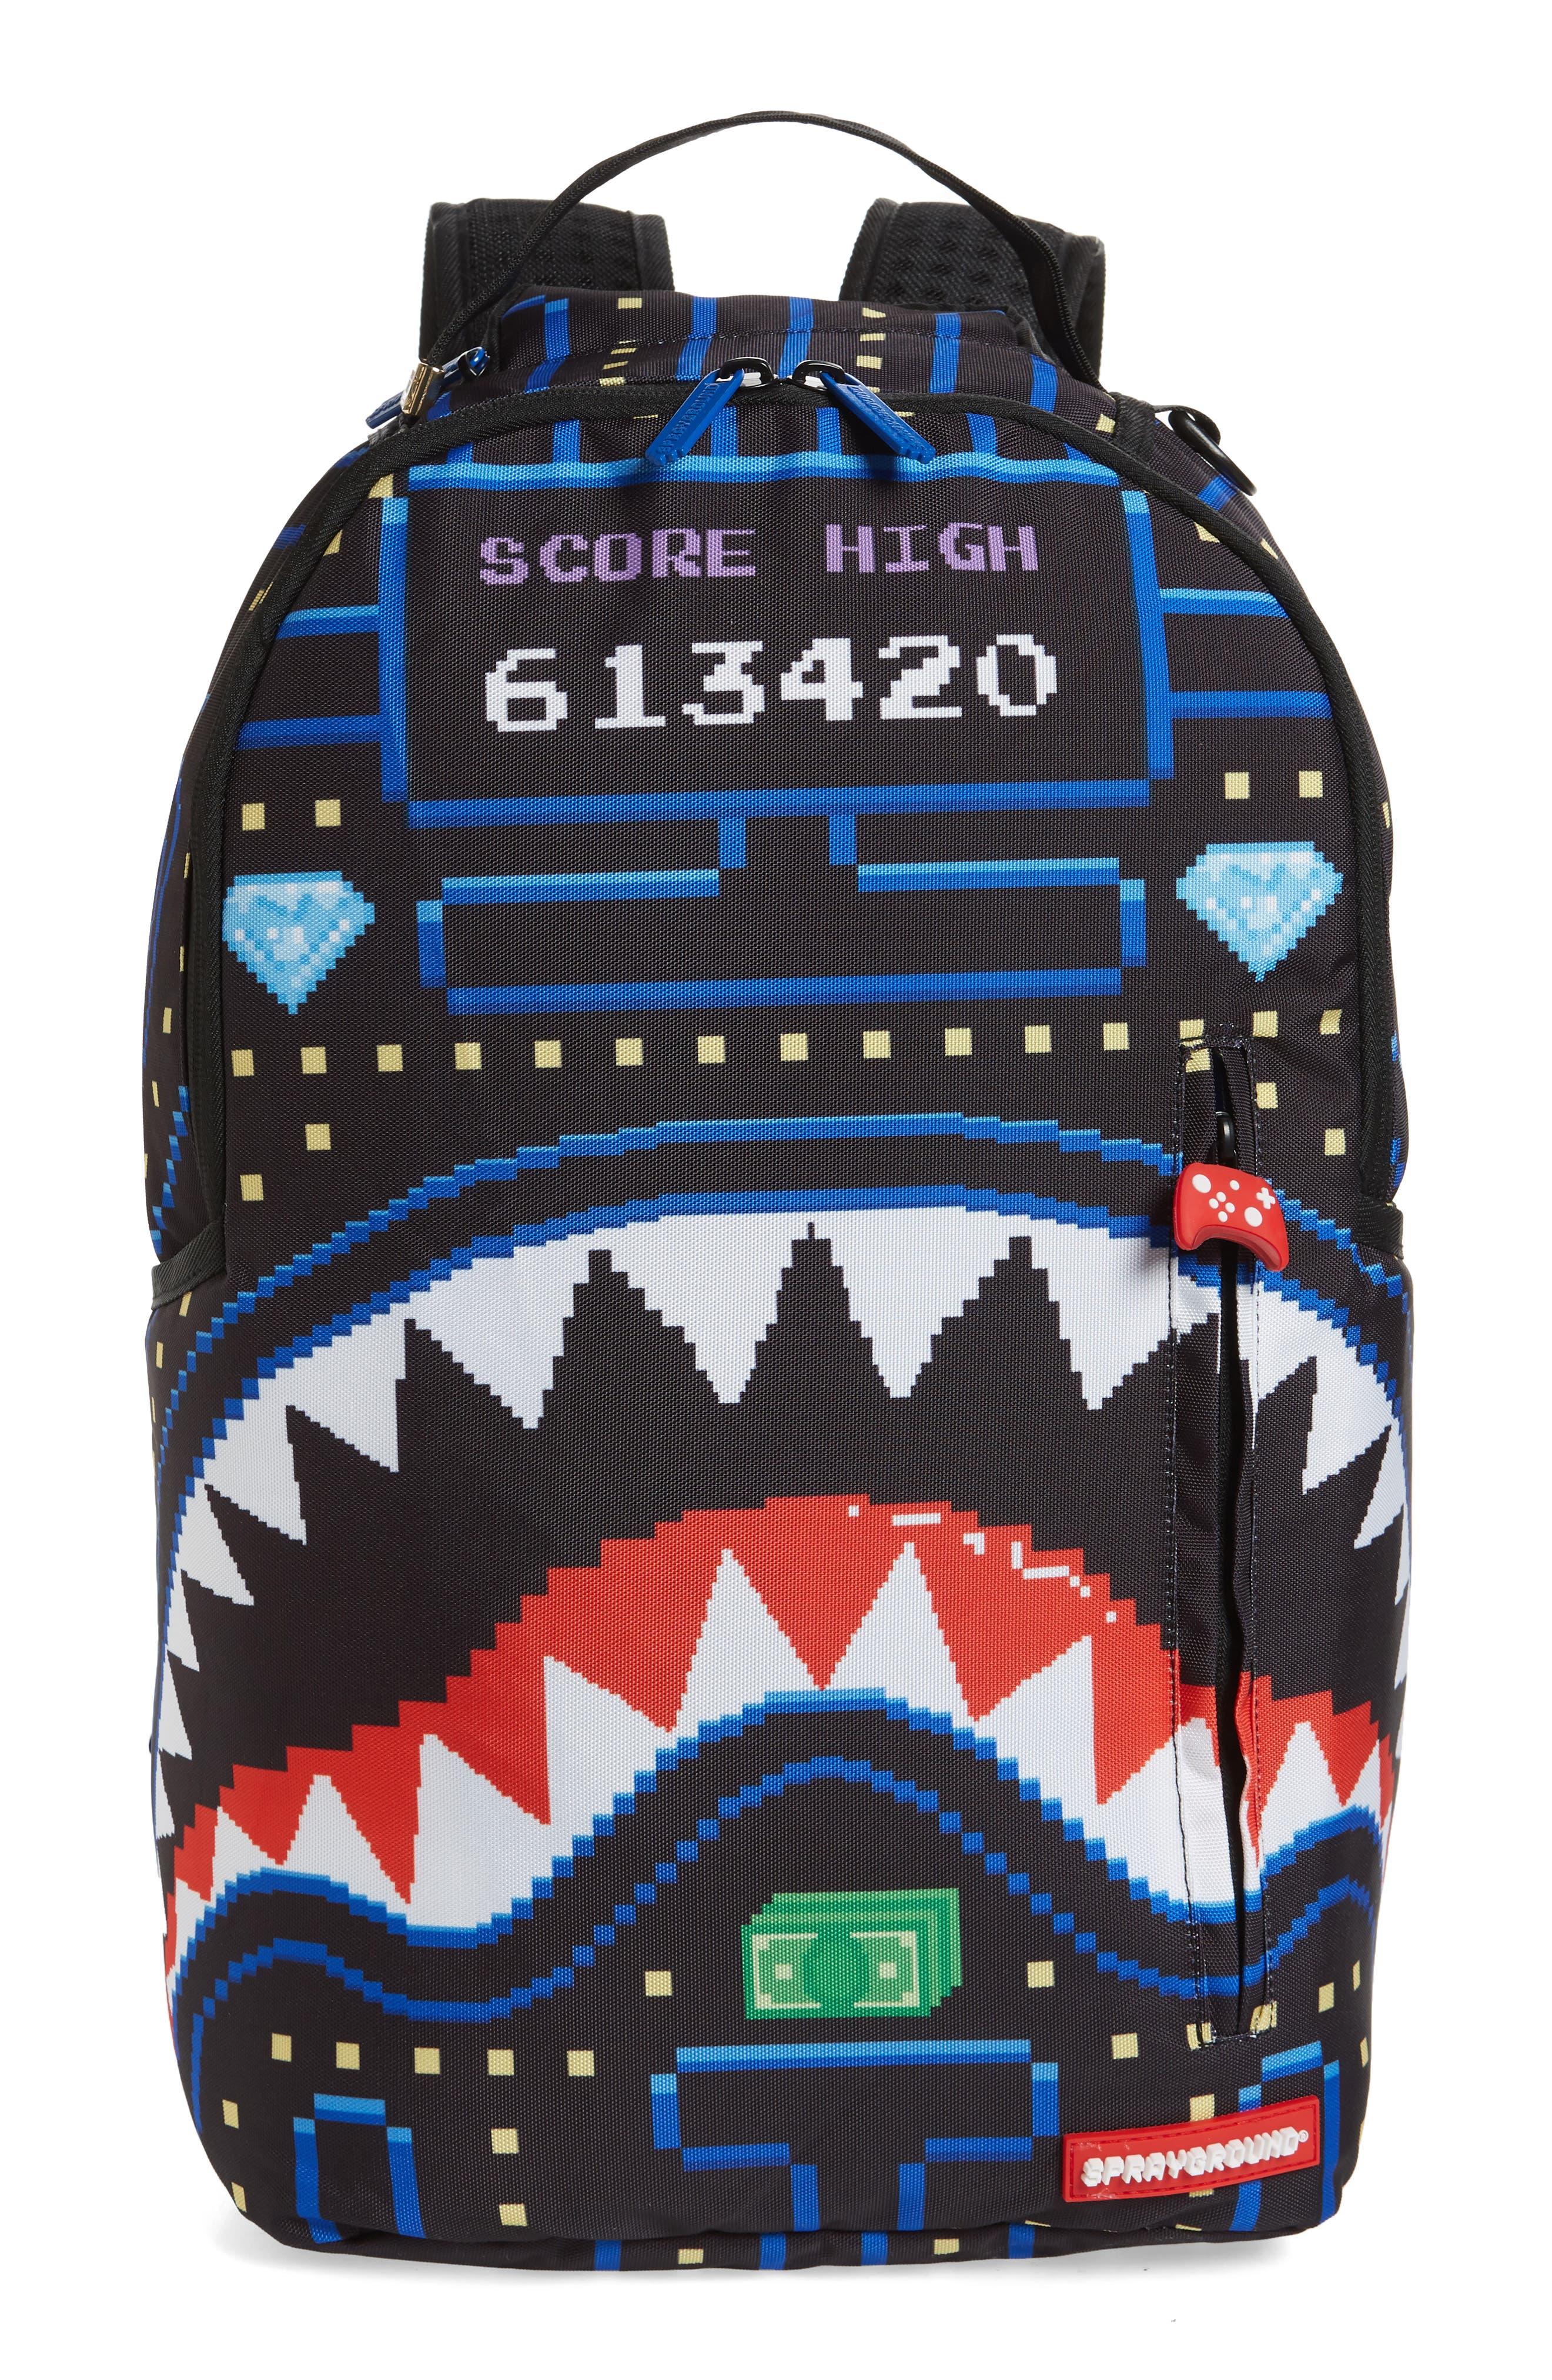 Sprayground Arcade Sharks Backpack - Black